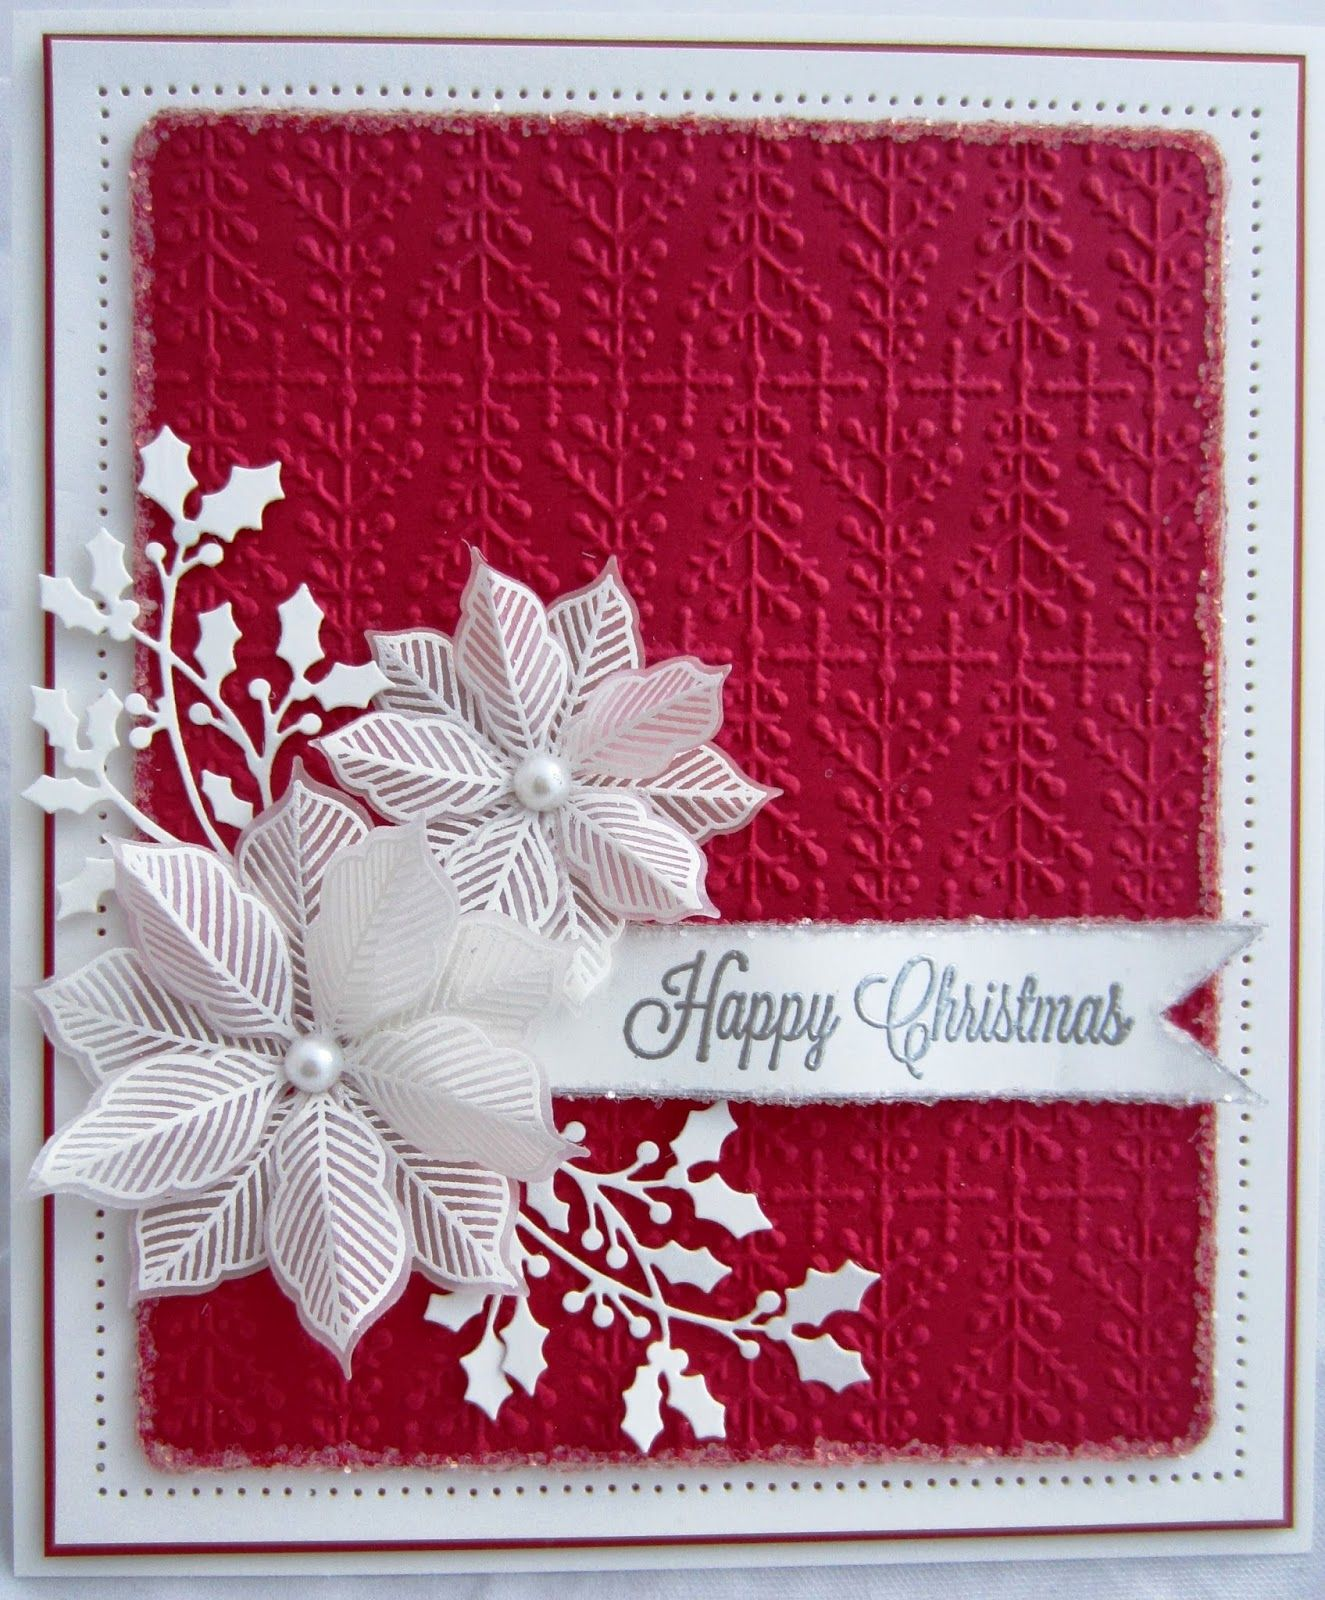 Scrapbook ideas christmas card - Handmade Christmas Cards